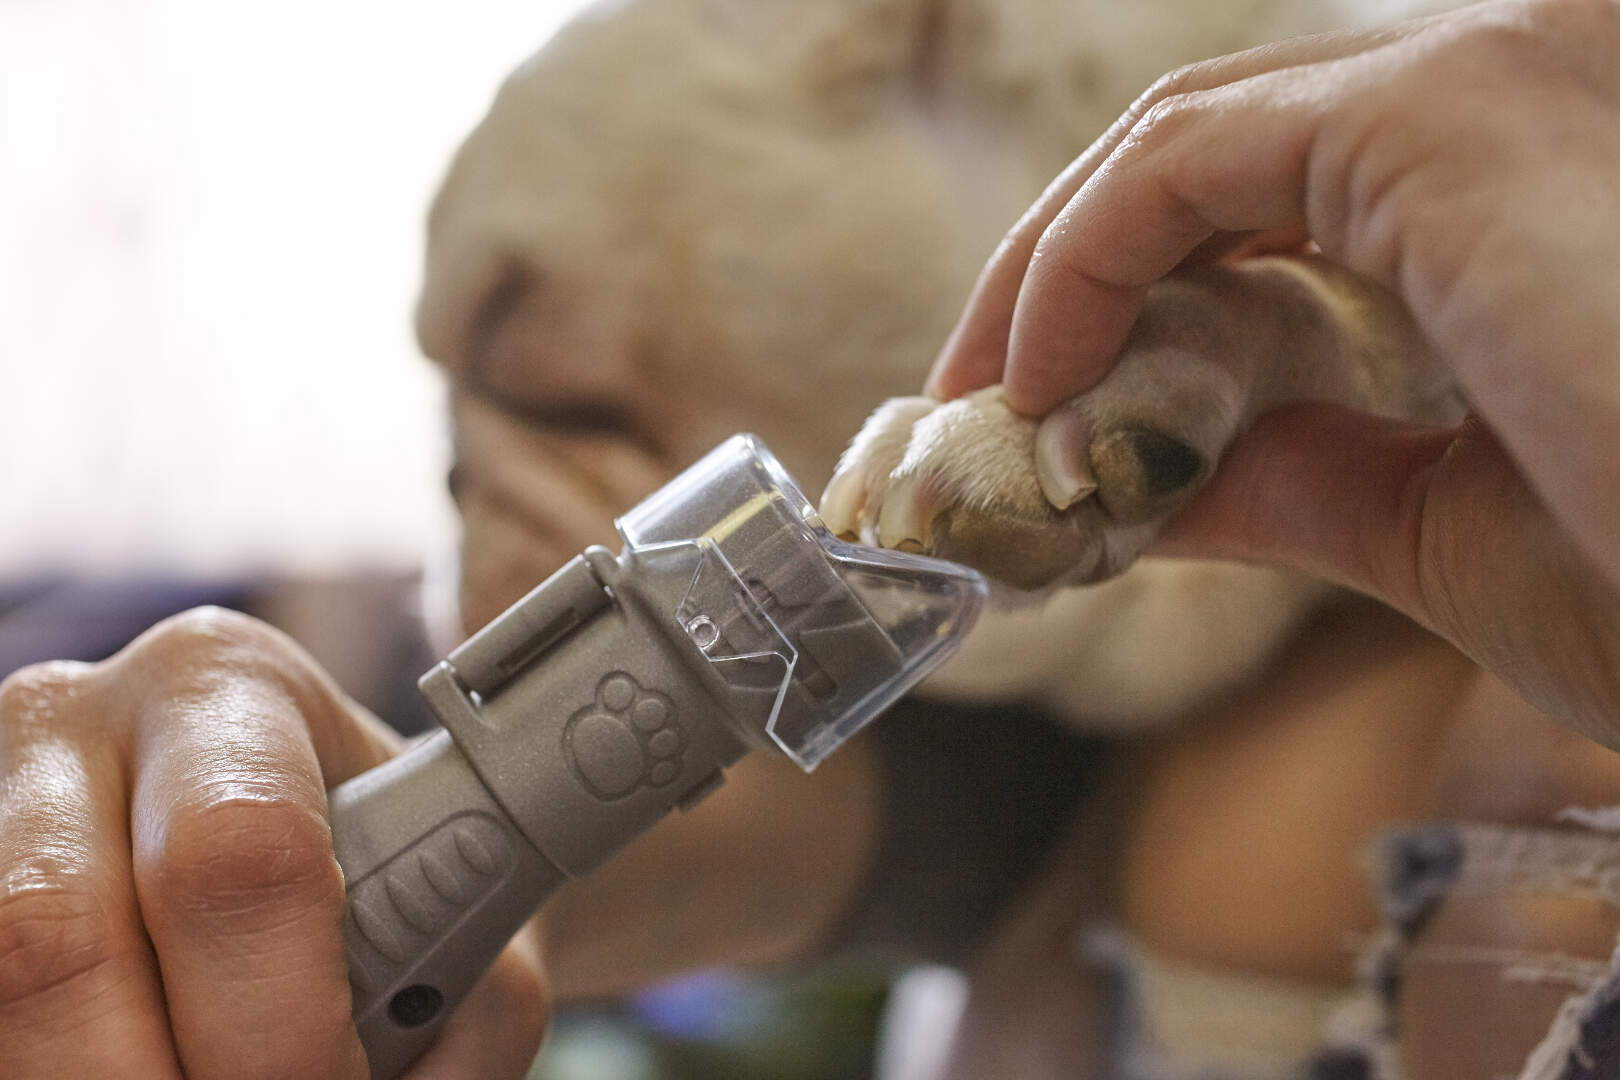 Dremel Pet Nail Grooming Kit alat za sečenje noktiju psima